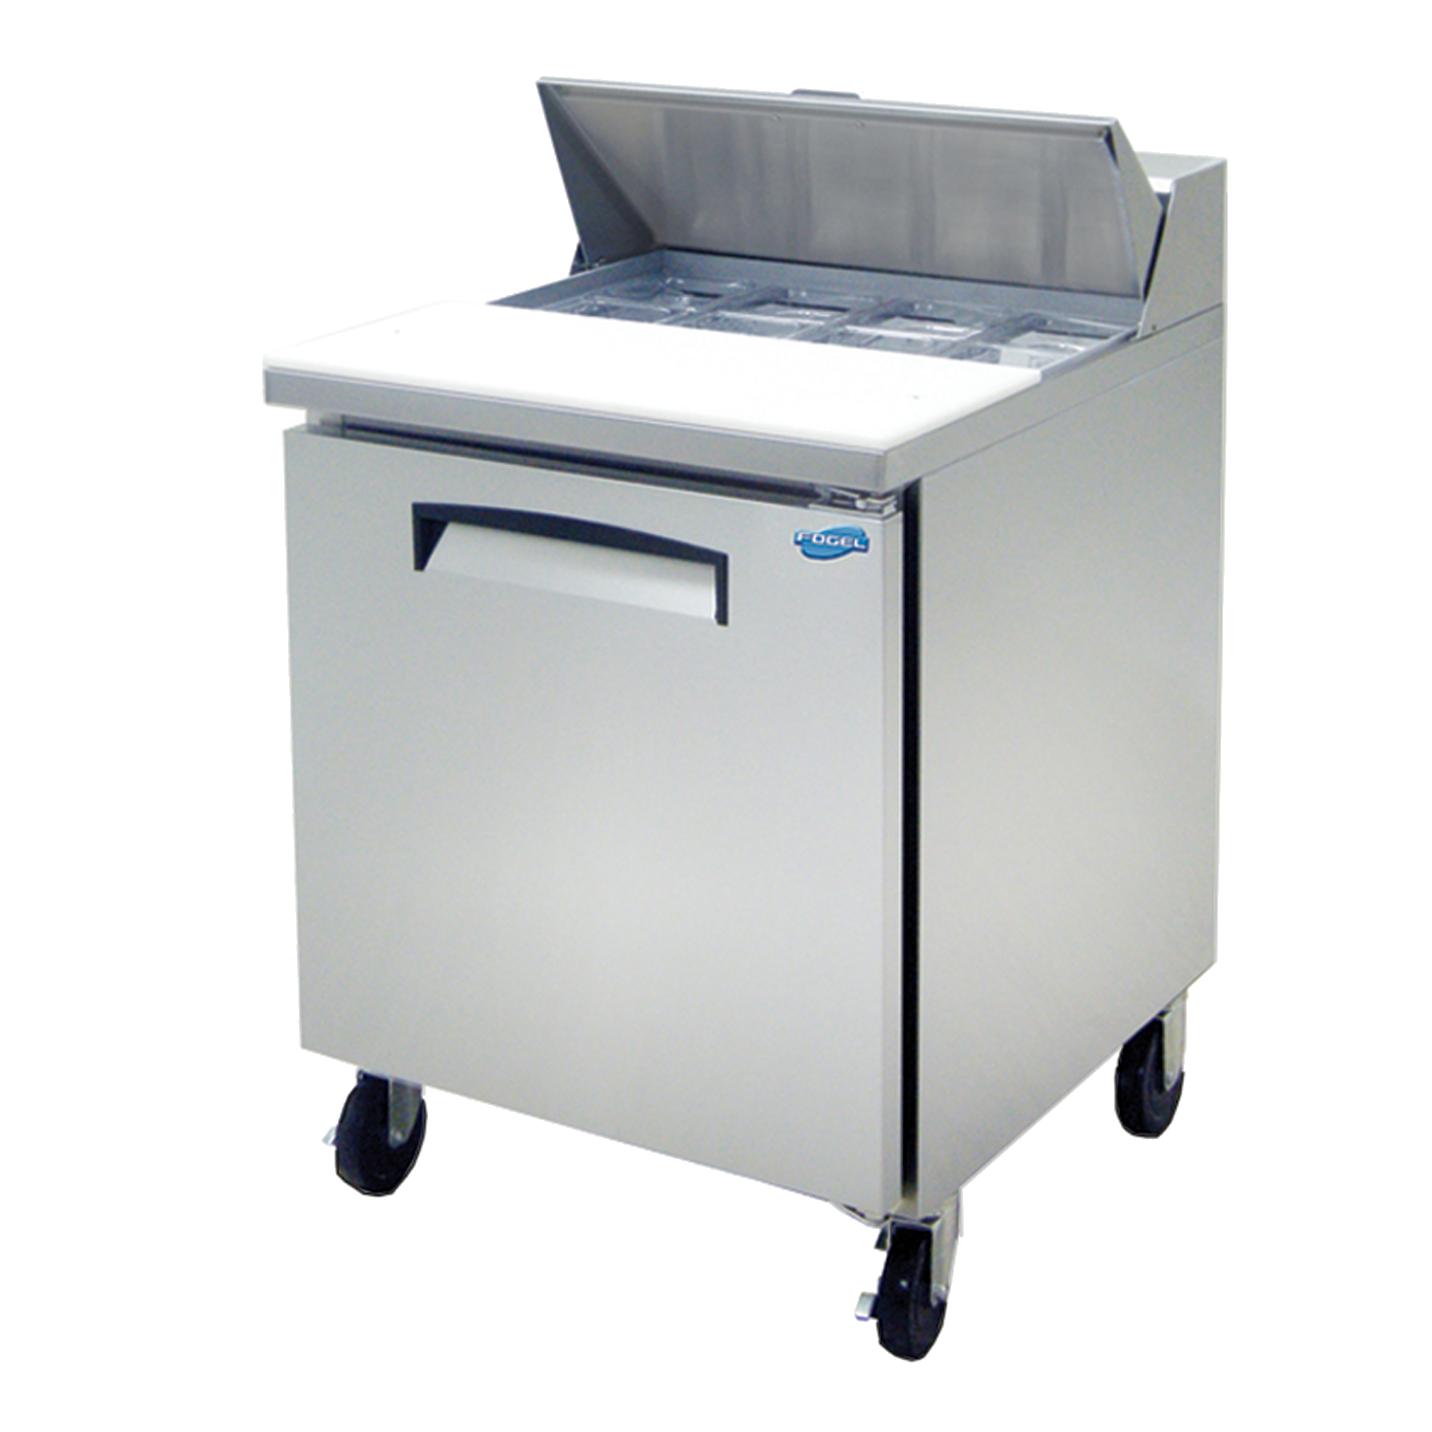 Fogel USA FLP-27-8 refrigerated counter, sandwich / salad unit